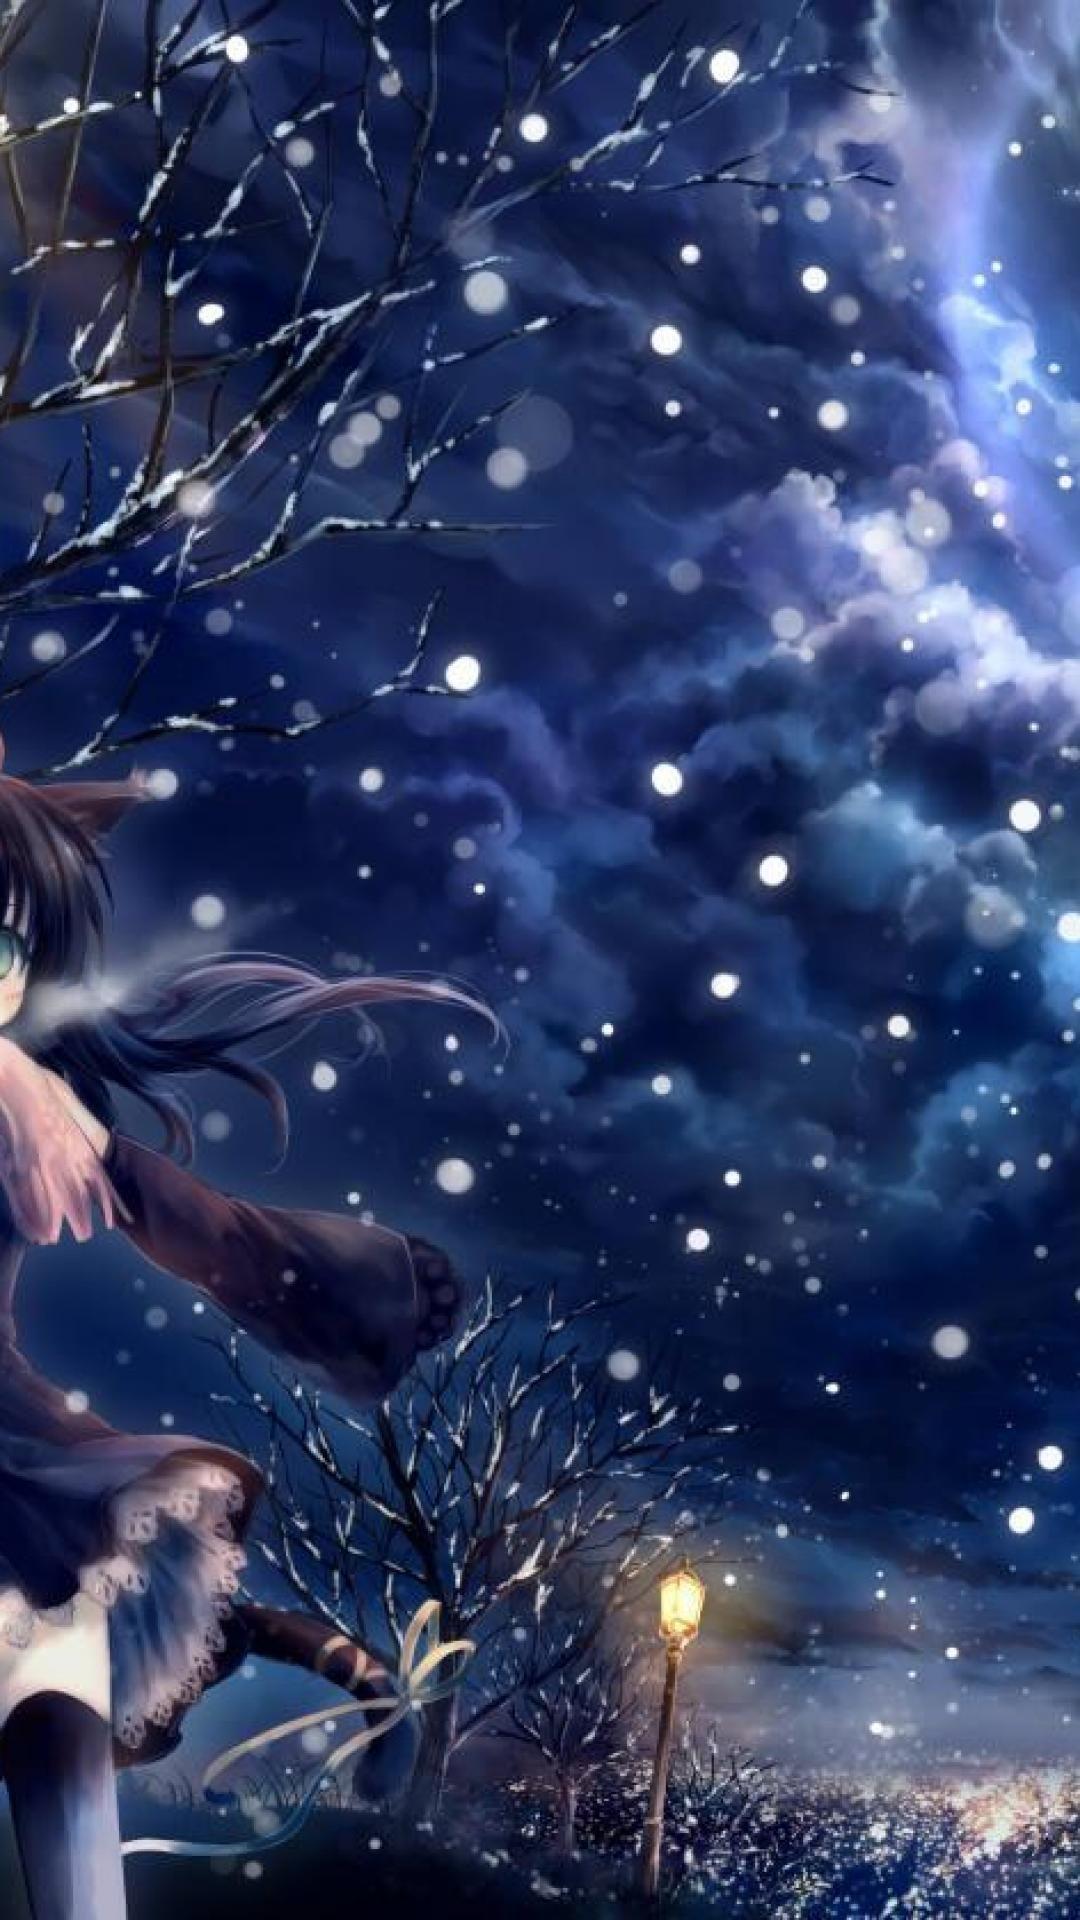 Anime Wallpaper 1366x768 : anime, wallpaper, 1366x768, Https://all-images.net/iphone-wallpaper-anime-hd-77/, Iphone, Wallpaper, Anime, Hd-77, Check